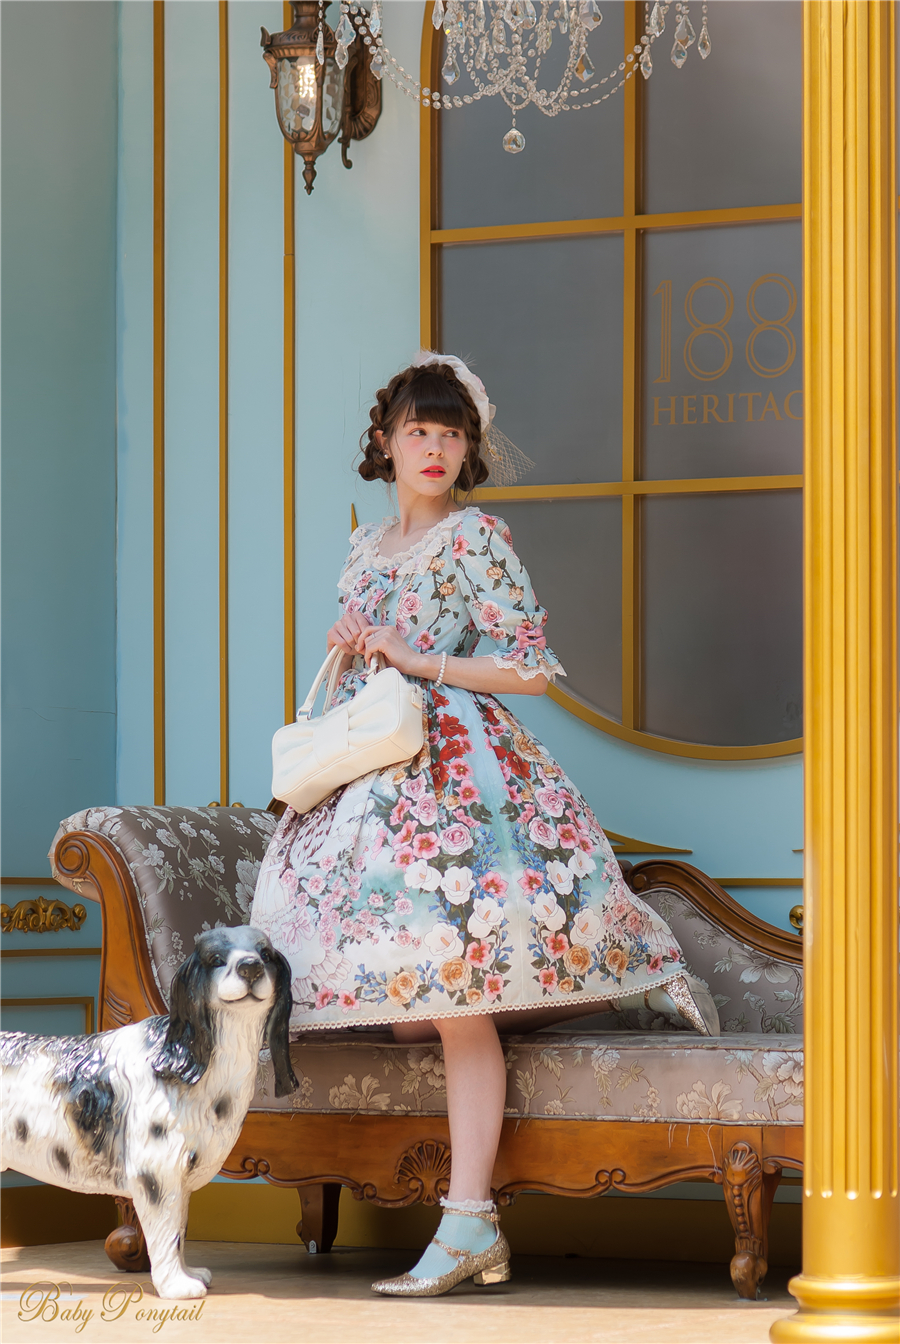 Baby Ponytail_Model Photo_Polly's Garden of Dreams_OP Lagoon Blue_Claudia_10.jpg